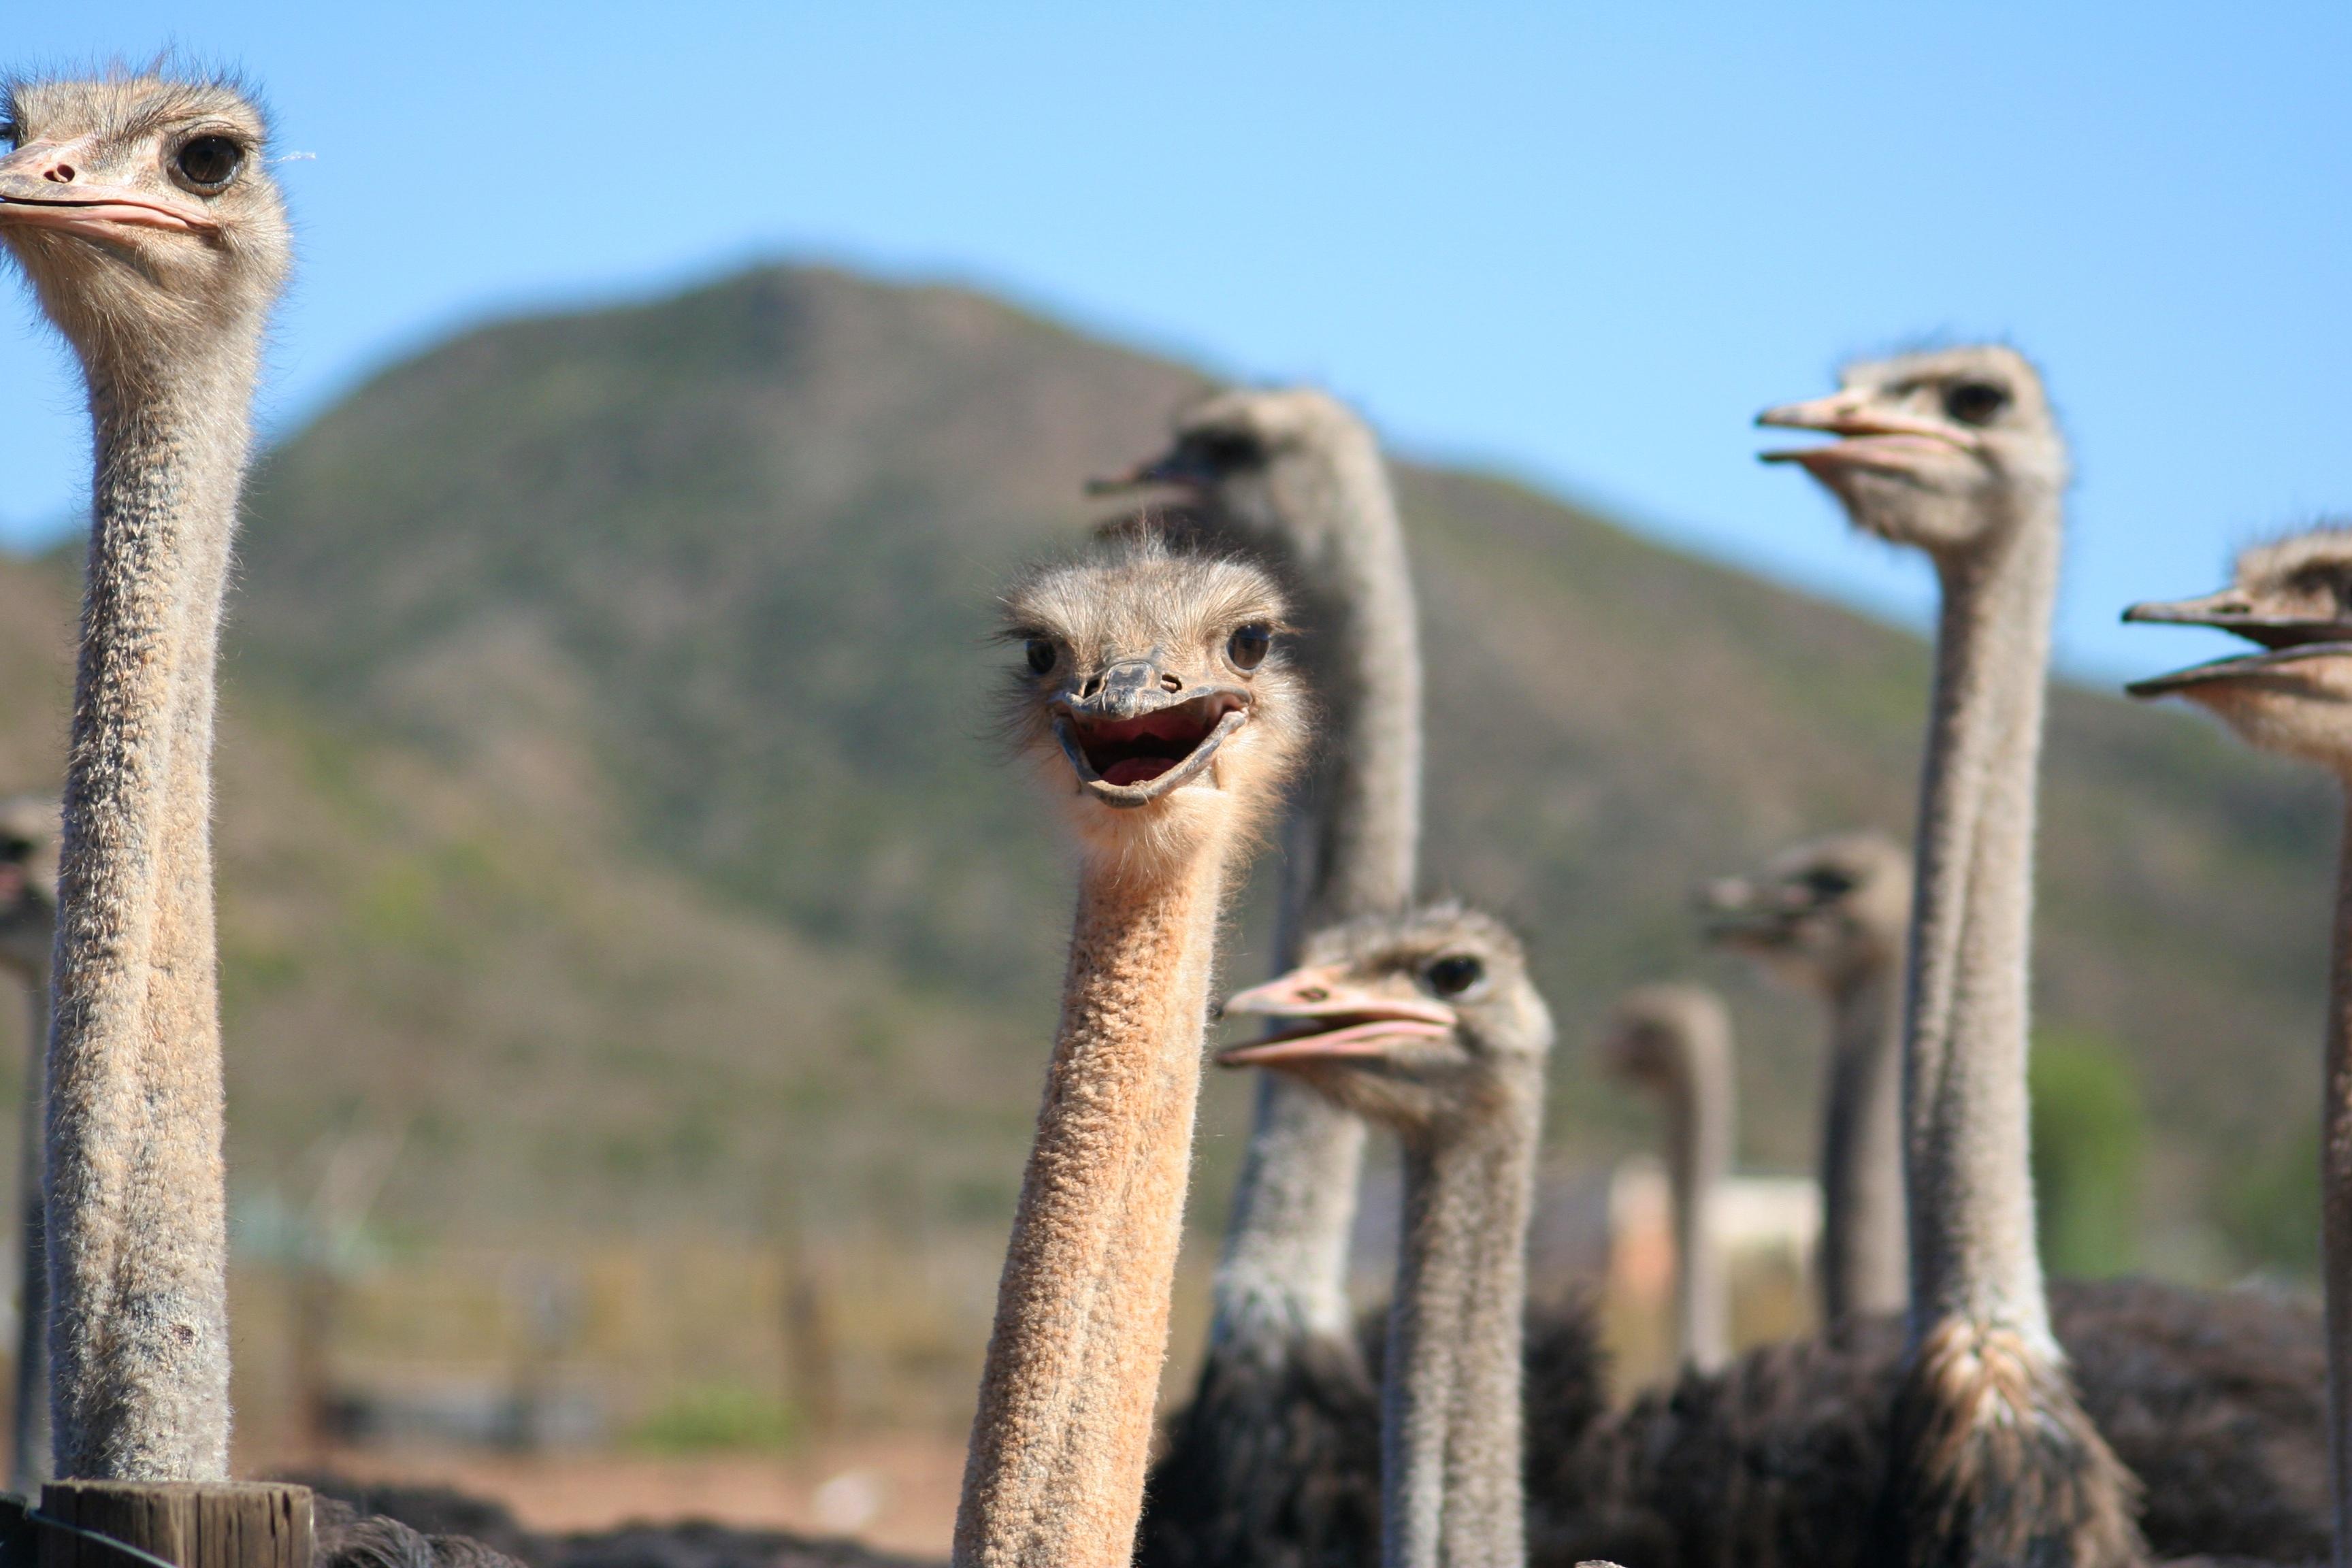 File:Ostrich Farm (6649539209).jpg - Wikimedia Commons